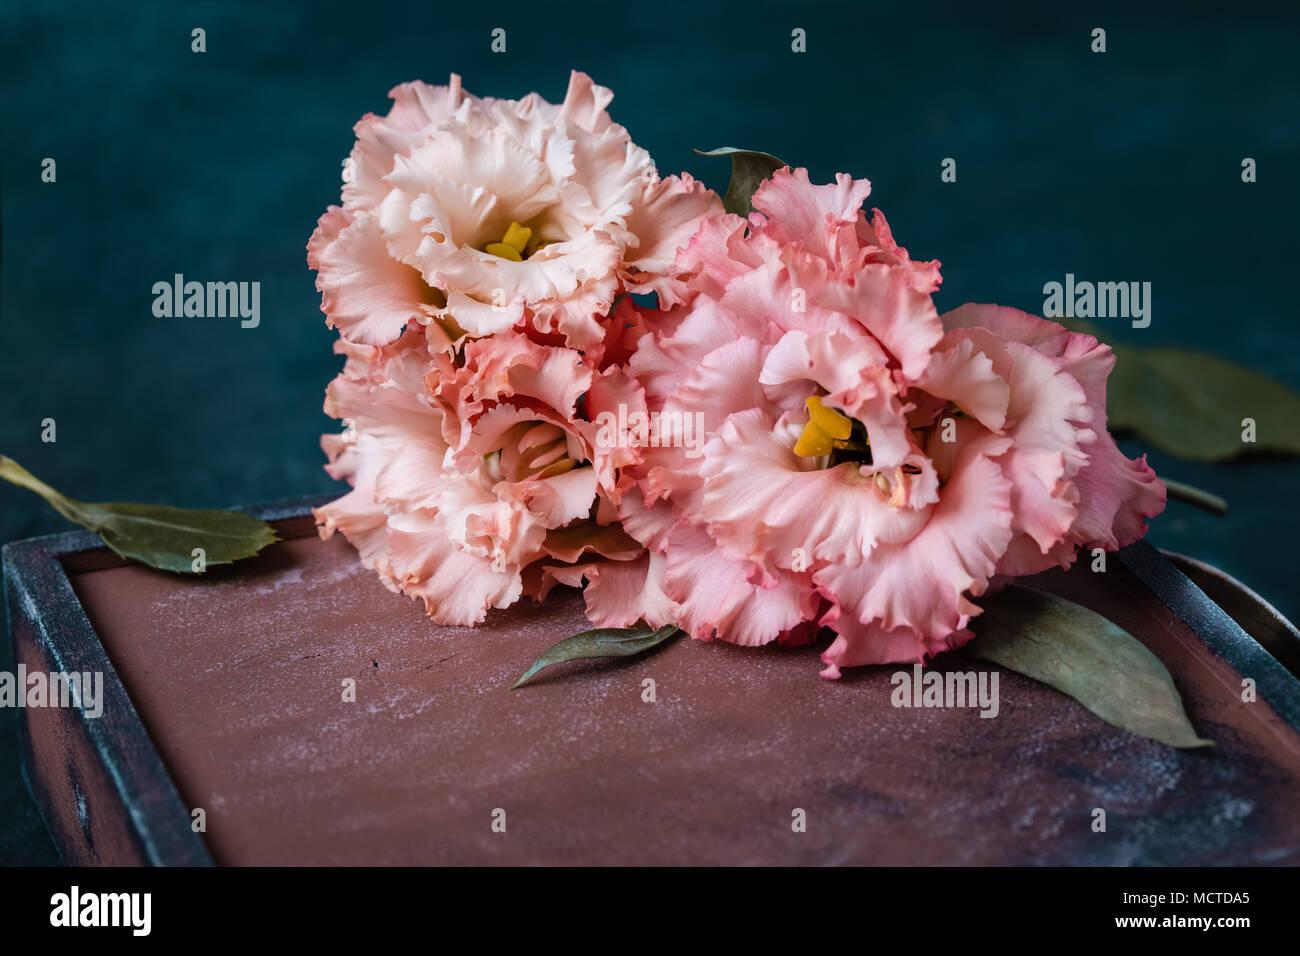 Pink garden carnations in the old box on dark background, postcard ...